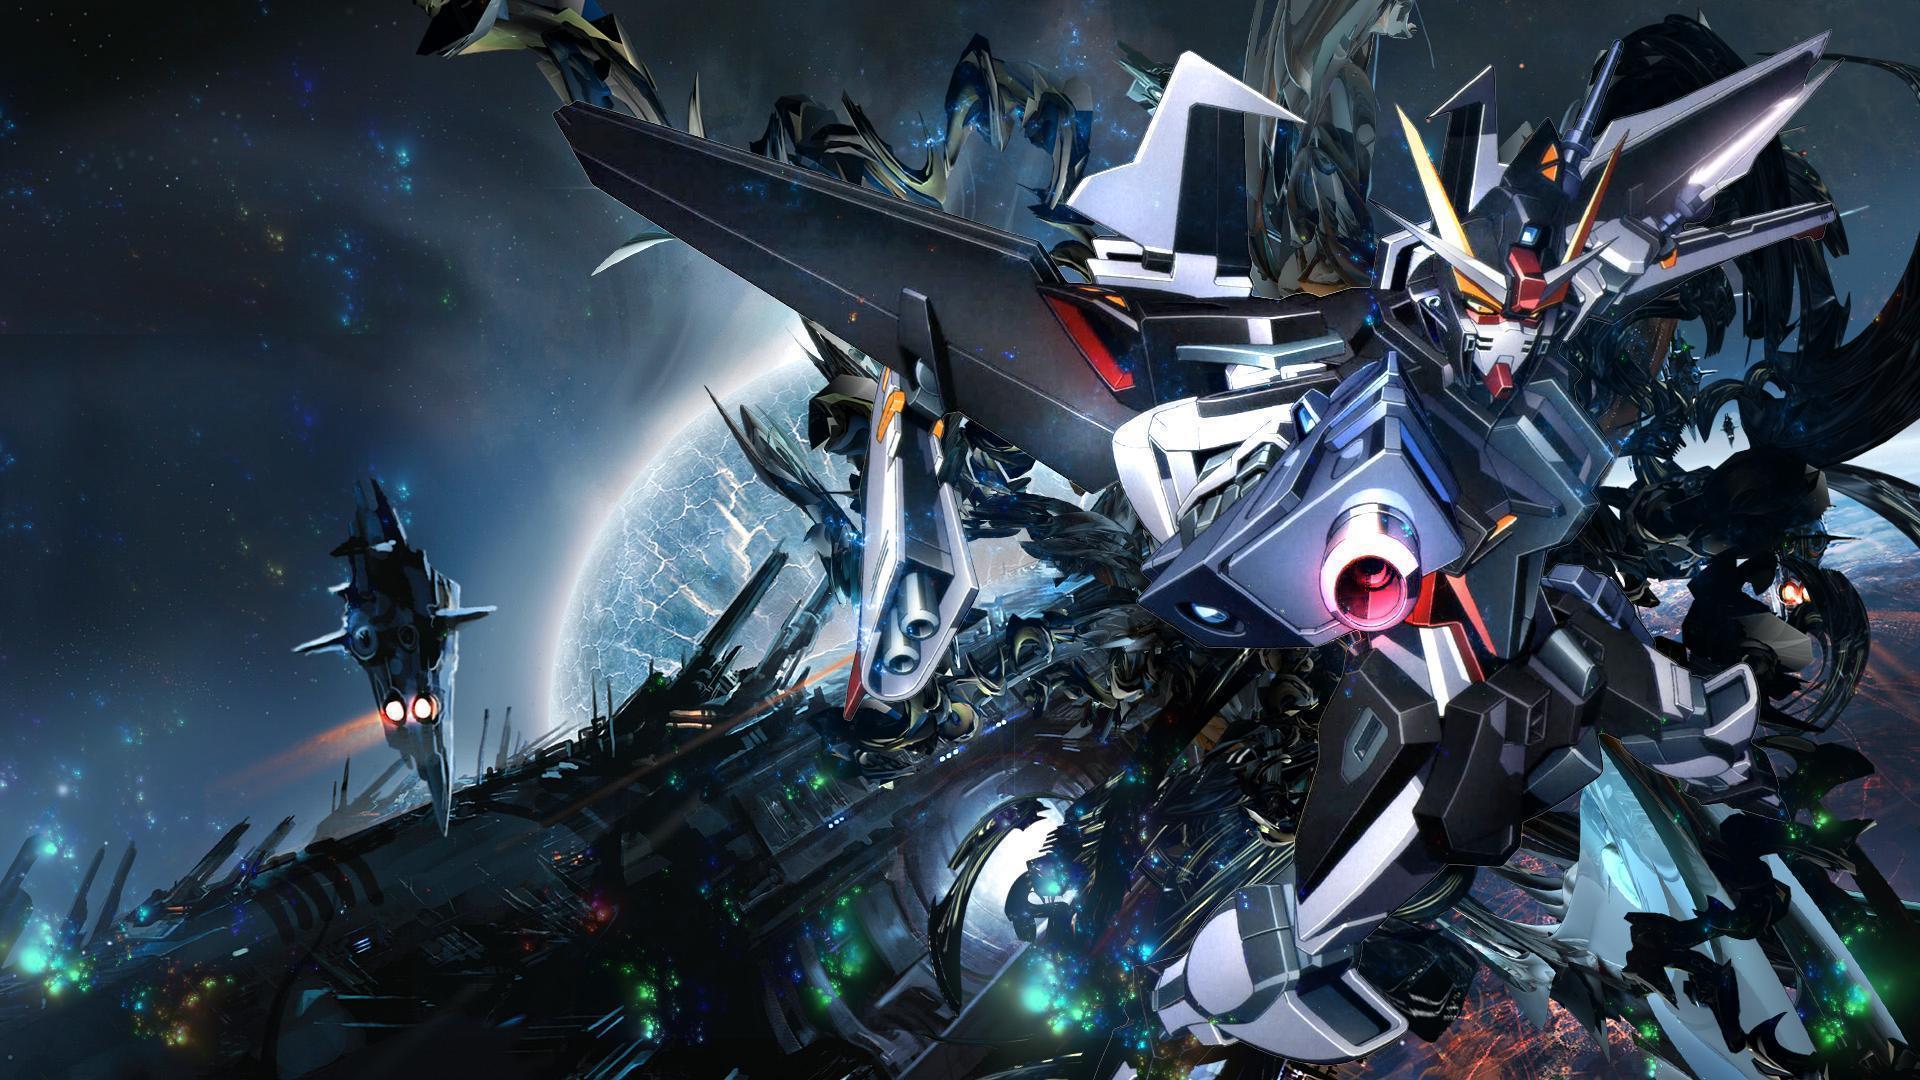 Gundam hd wallpapers wallpaper cave New all hd video